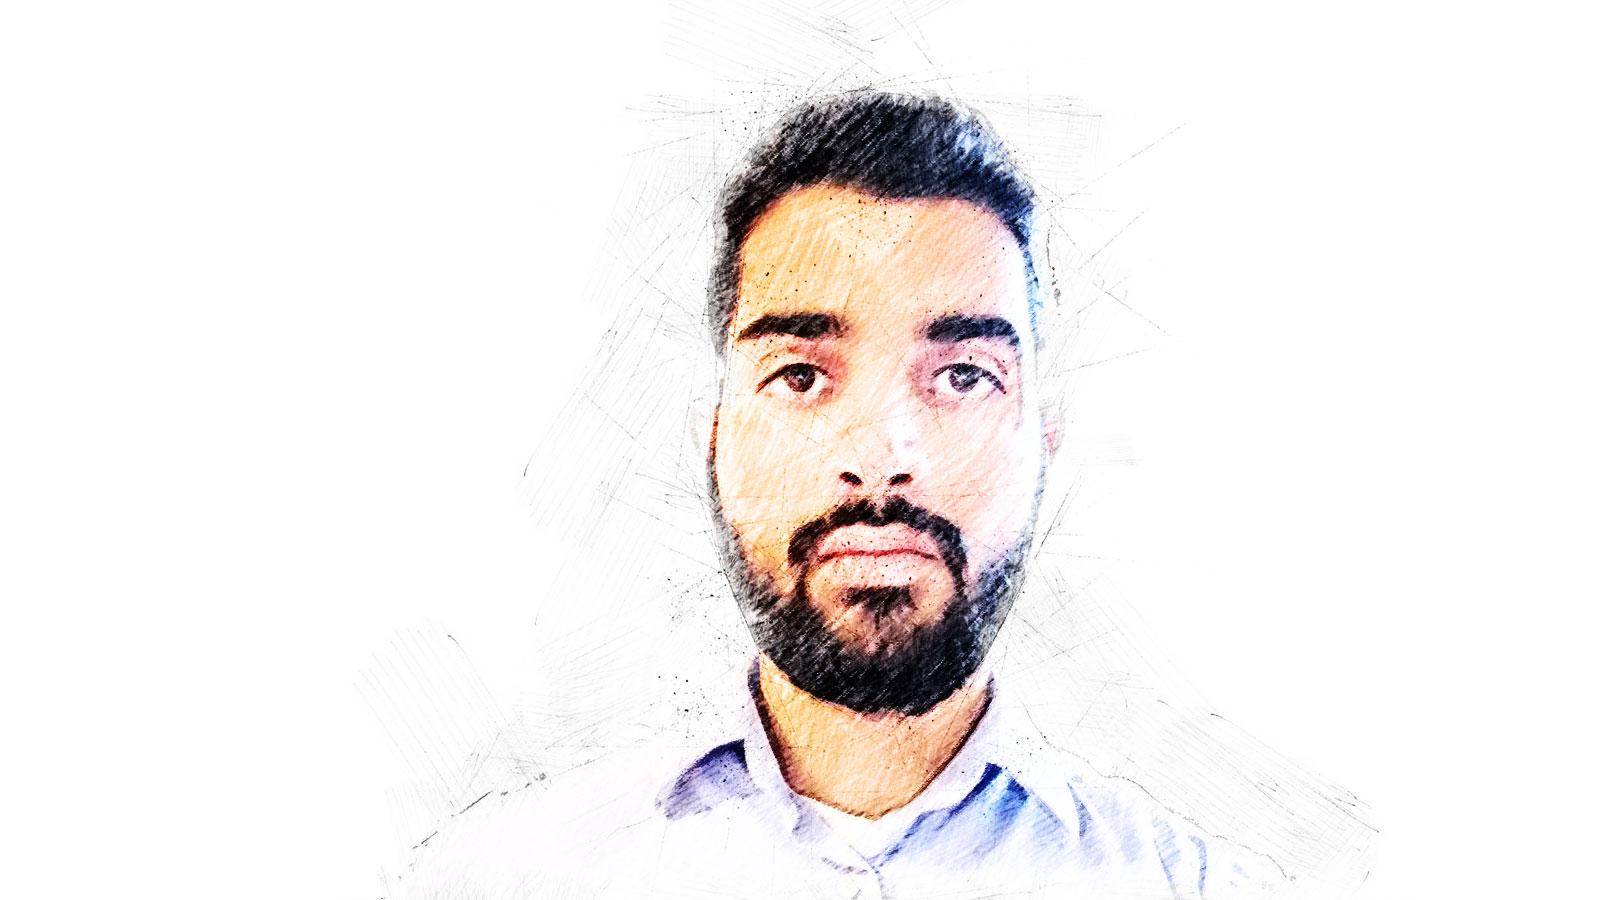 Elias Feroz, Migazin, Zeichnung, Profil, Islam, Flüchtlinge, Muslime